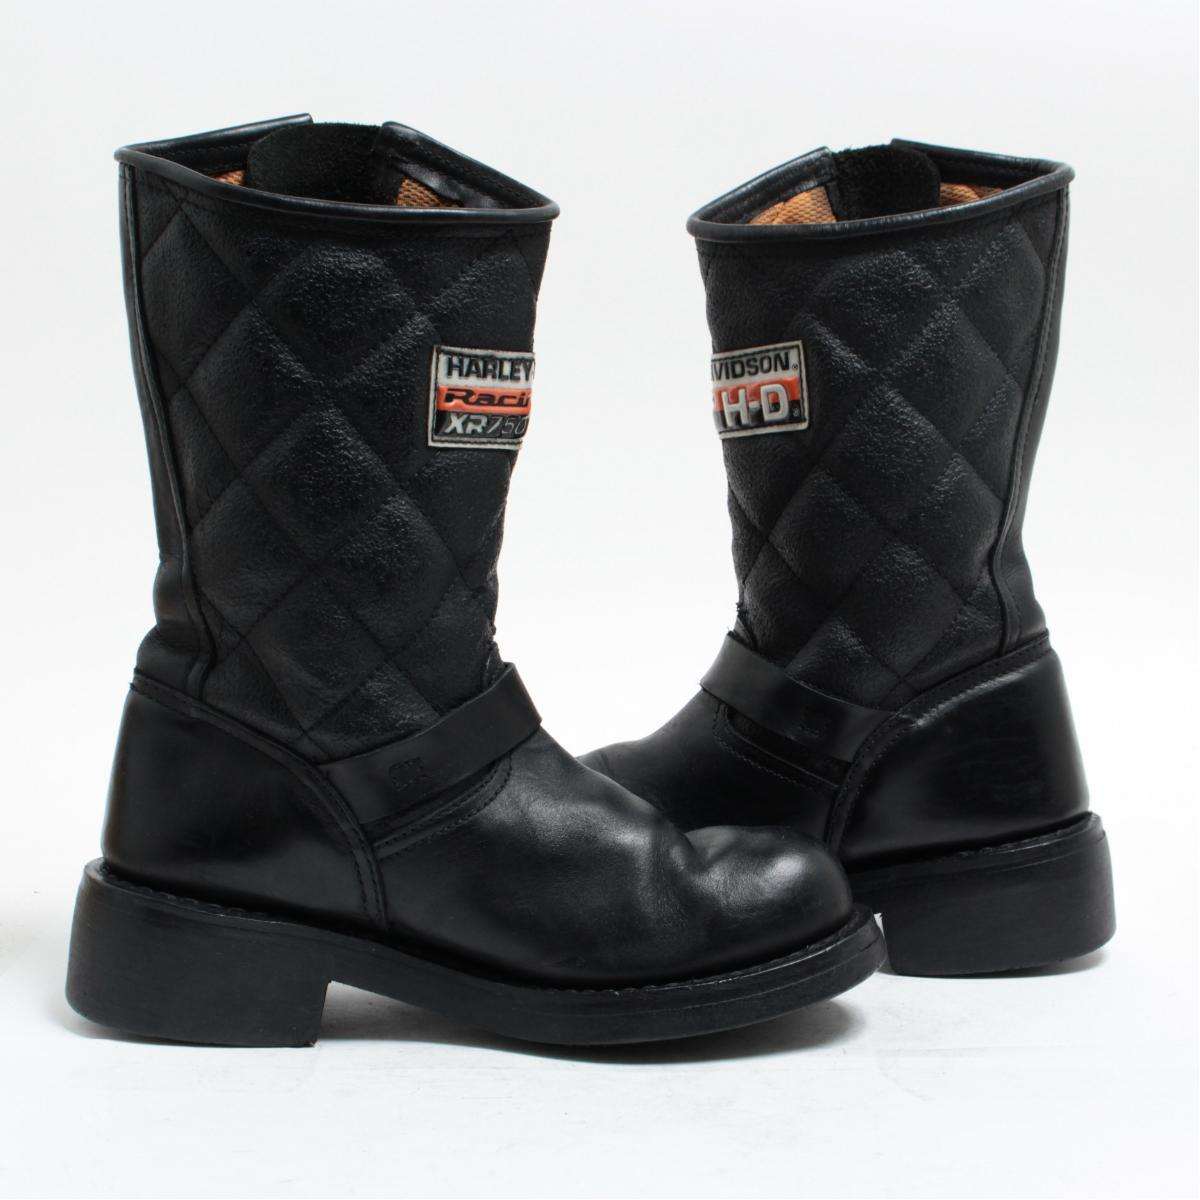 2c79e7afd0d Harley-Davidson Harley-Davidson engineer boots motorcycle boots US4 Lady's  22.0cm /bom0947